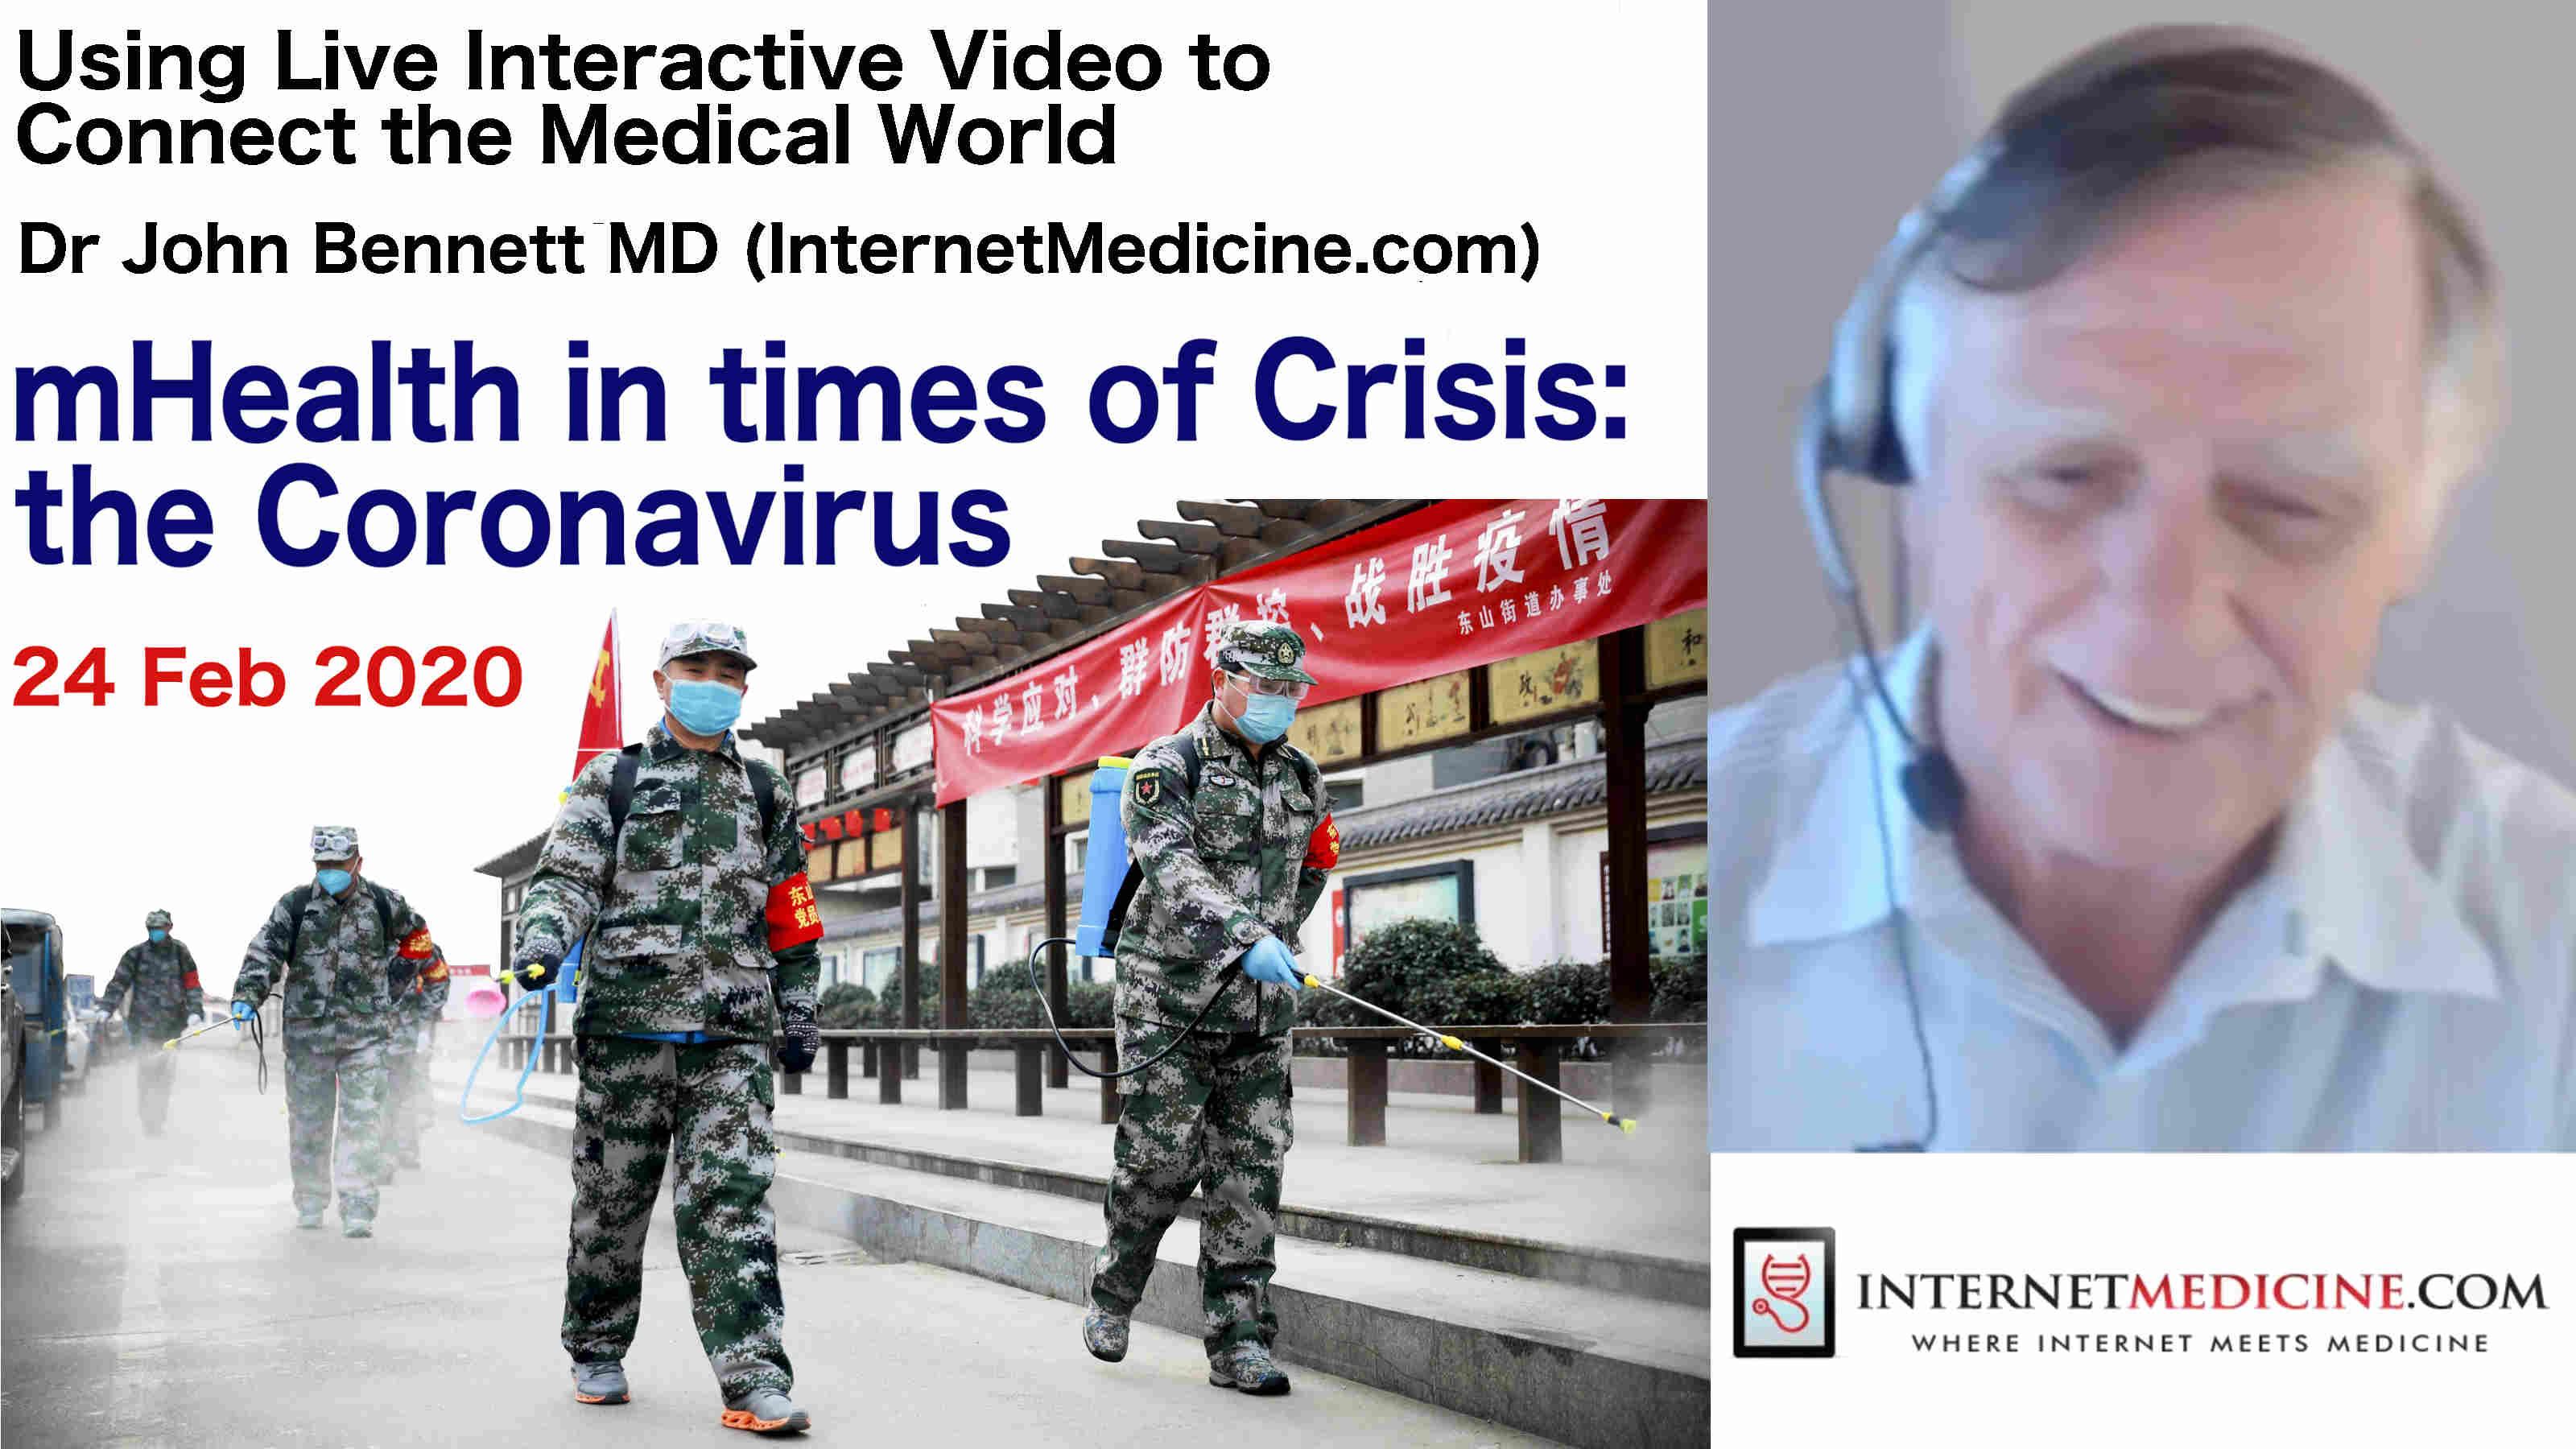 mHealth in Crisis InternetMedicine